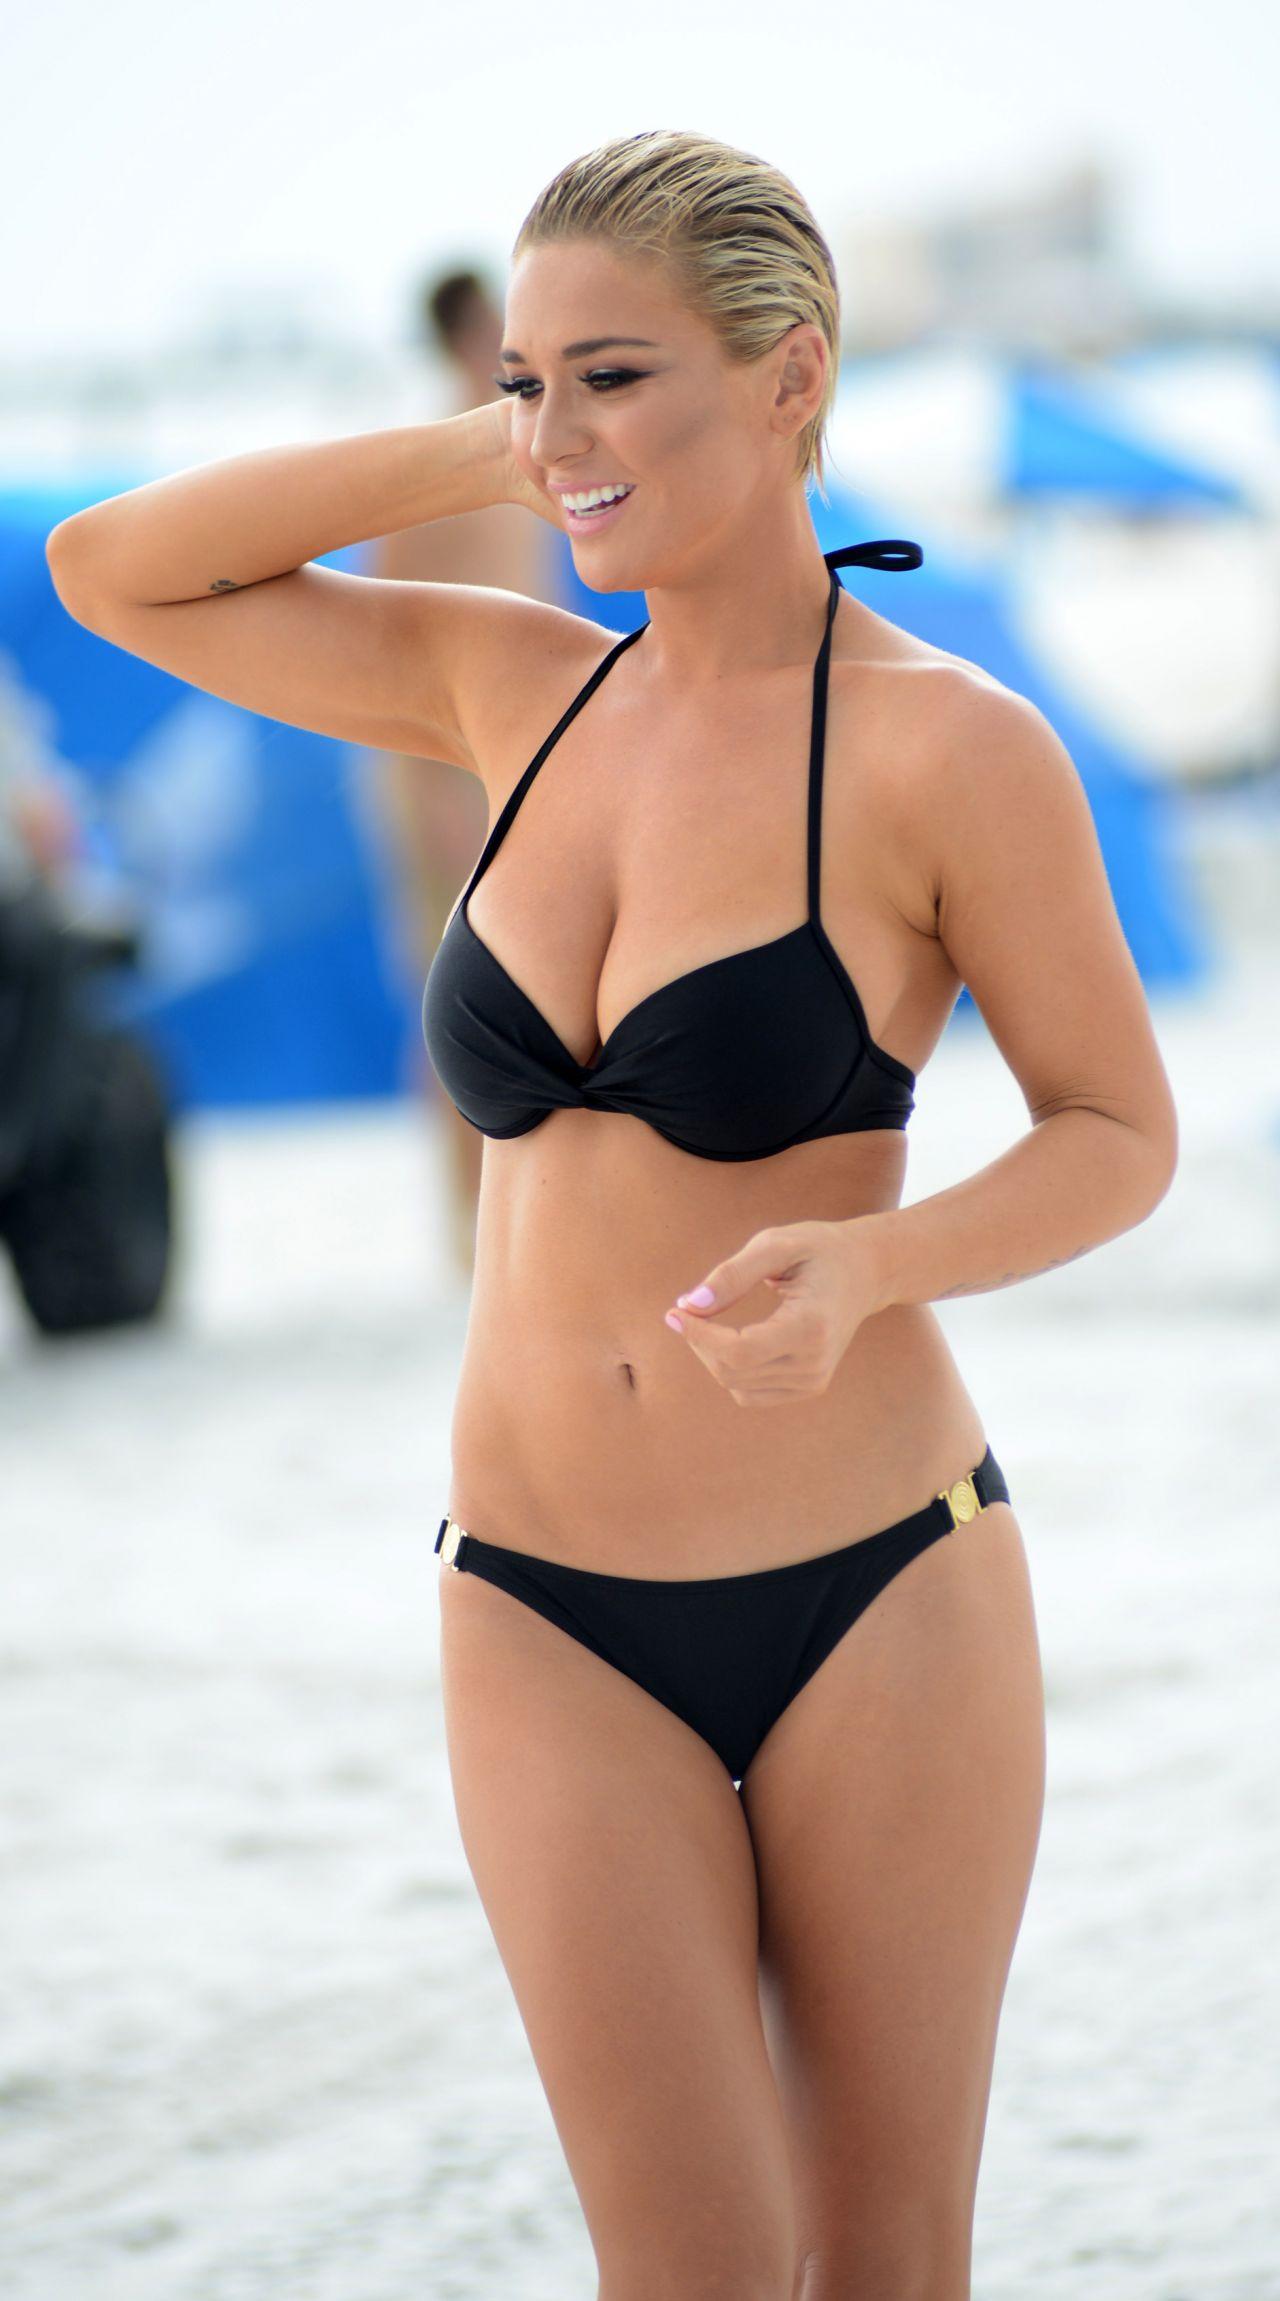 lauren-hubbard-bikini-photoshoot-miami-beach-10-19-2017-18.jpg